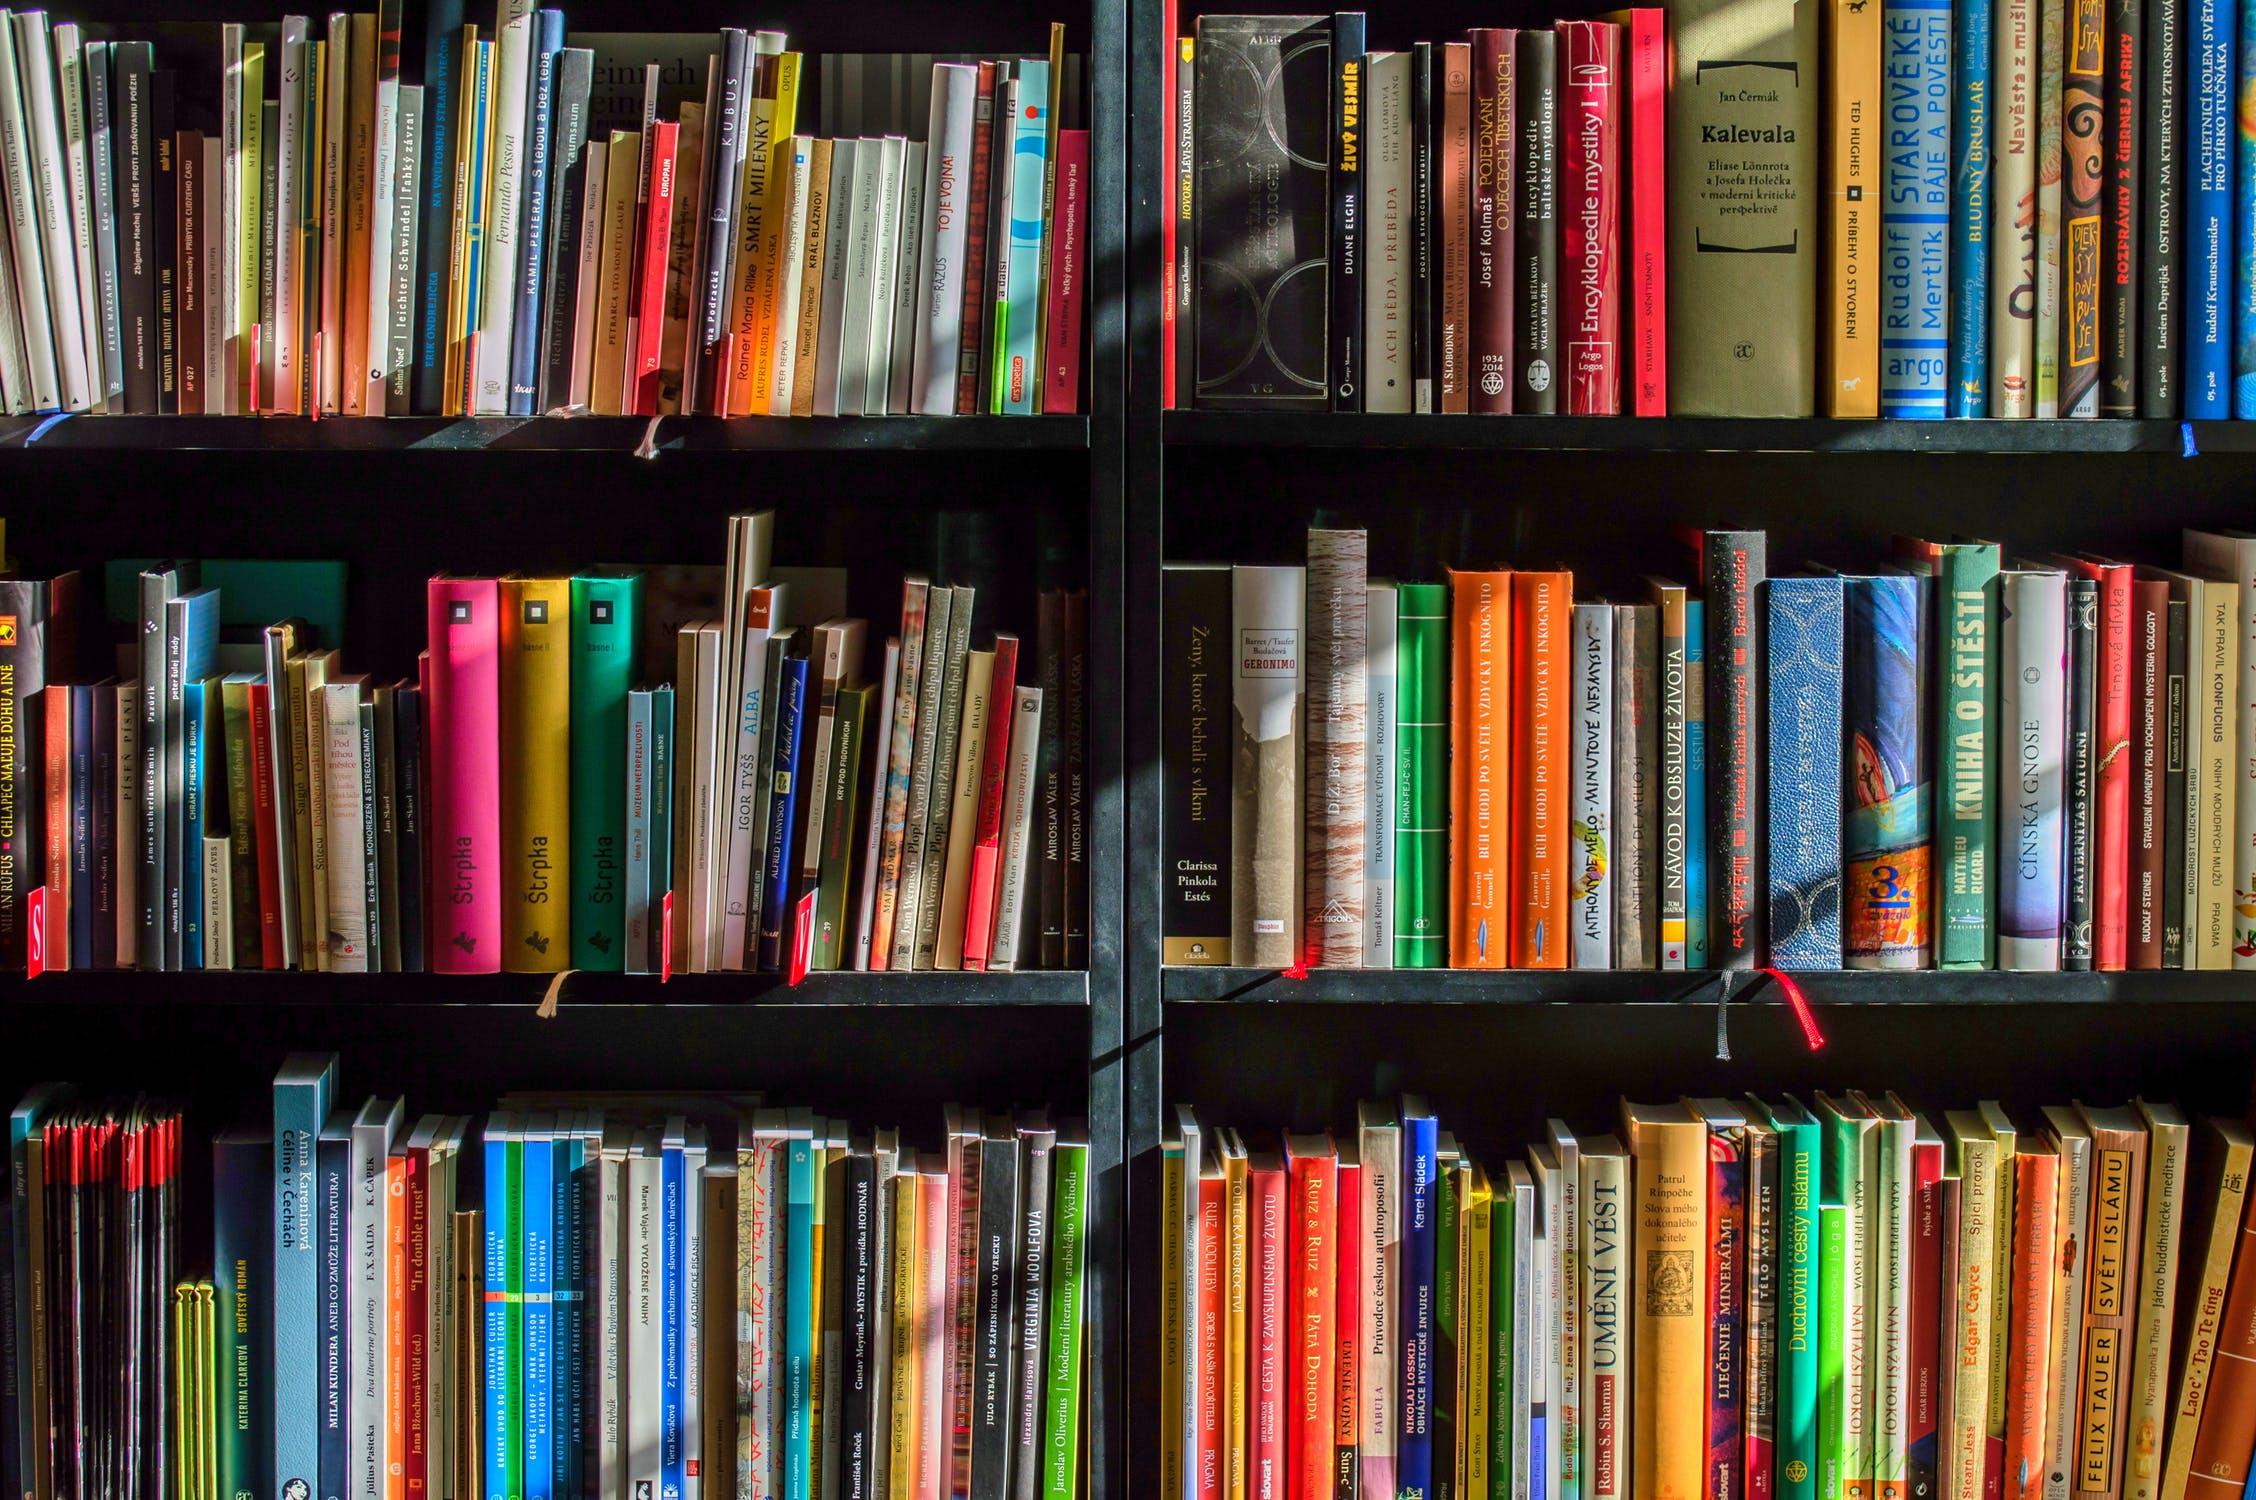 Books on a bookshelf